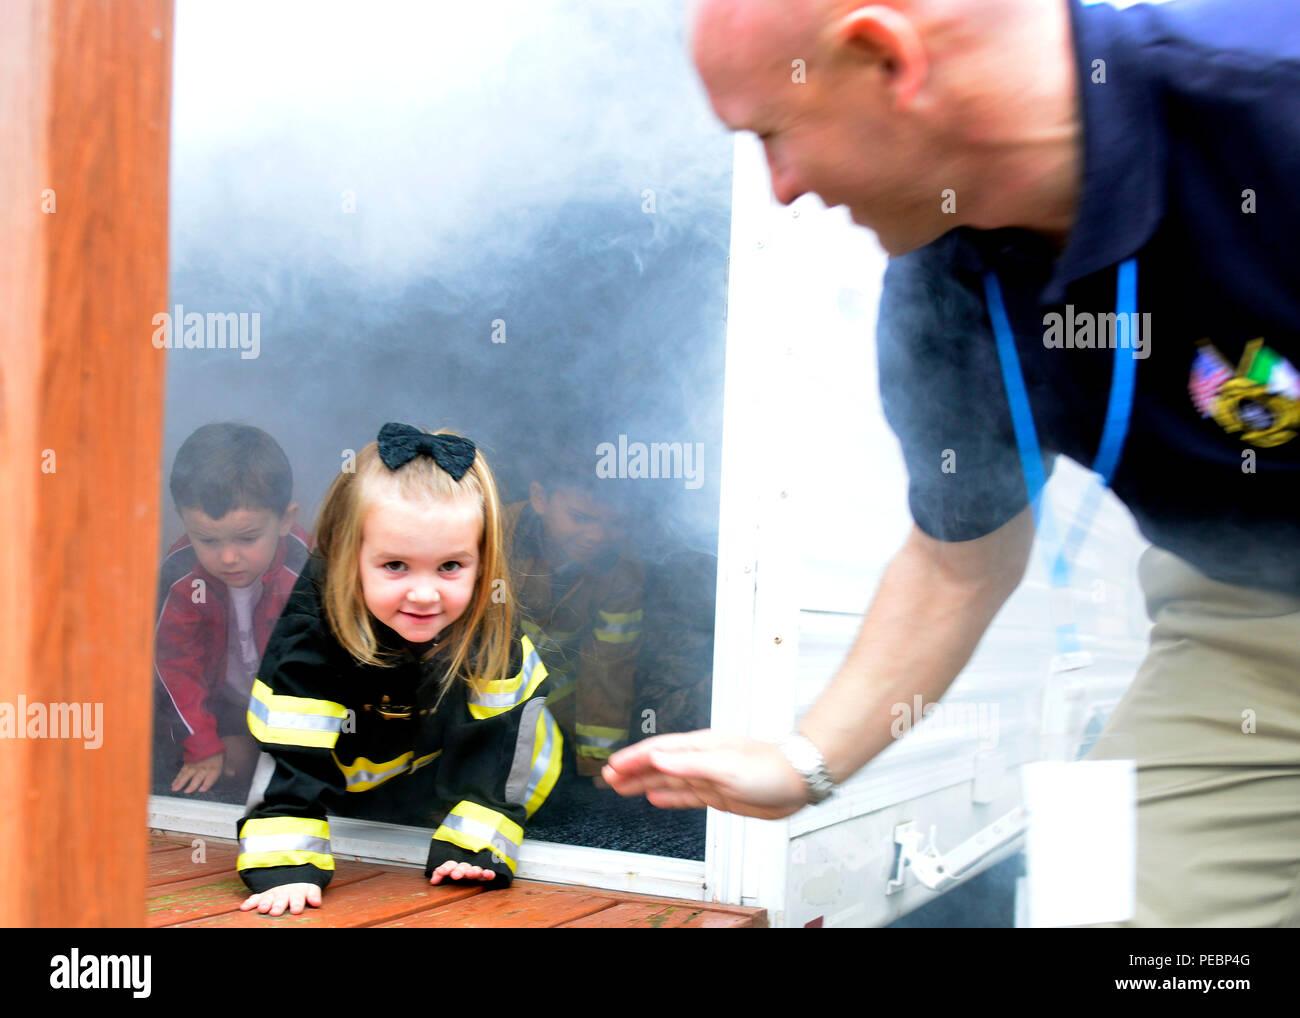 Smoke Detectors Stock Photos & Smoke Detectors Stock Images